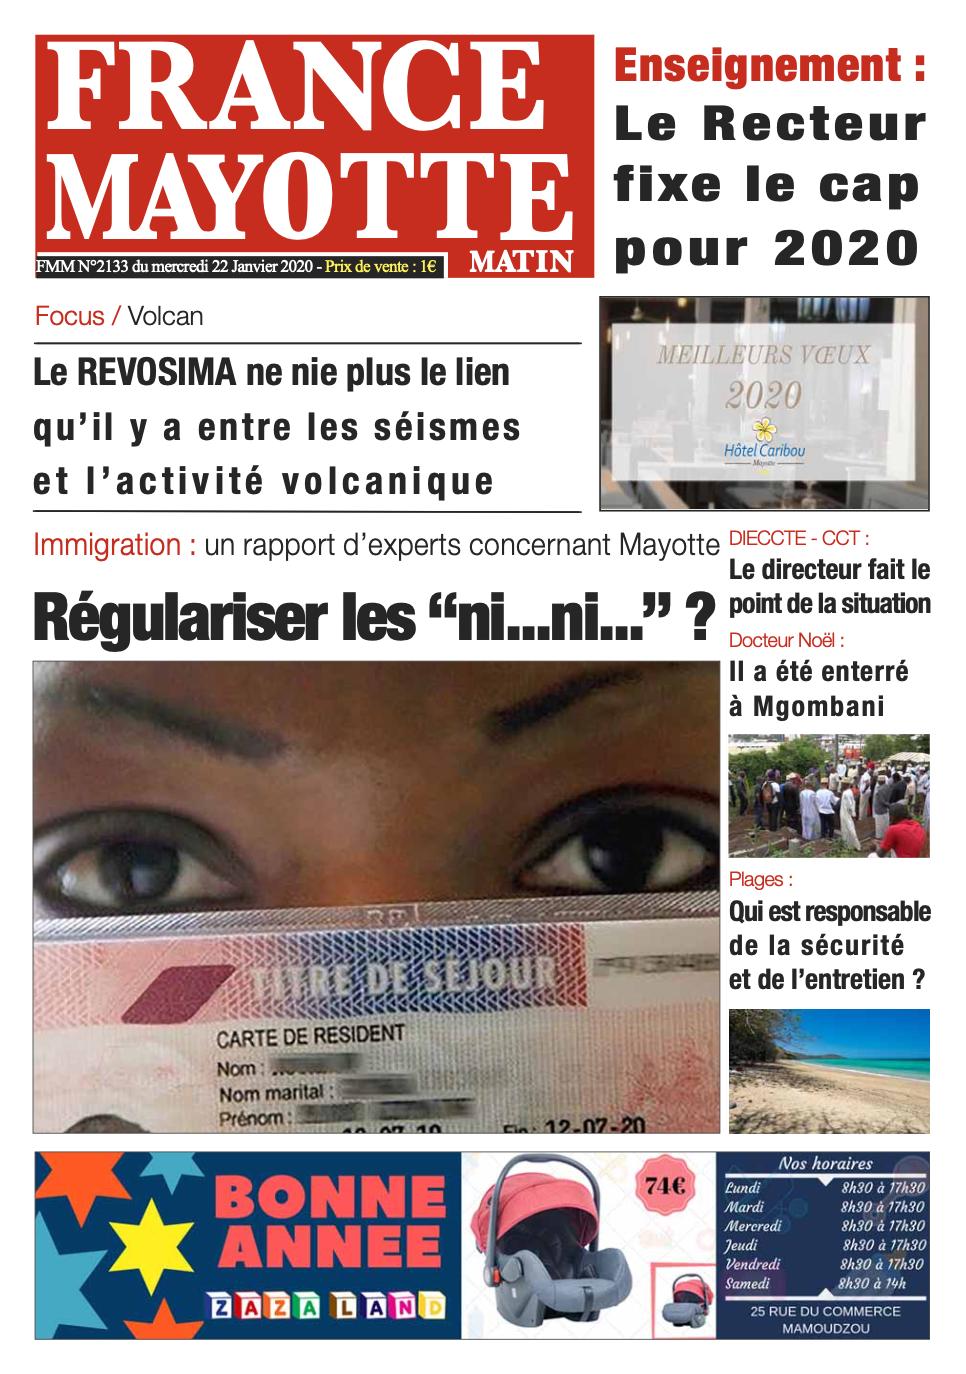 France Mayotte Mercredi 22 janvier 2020